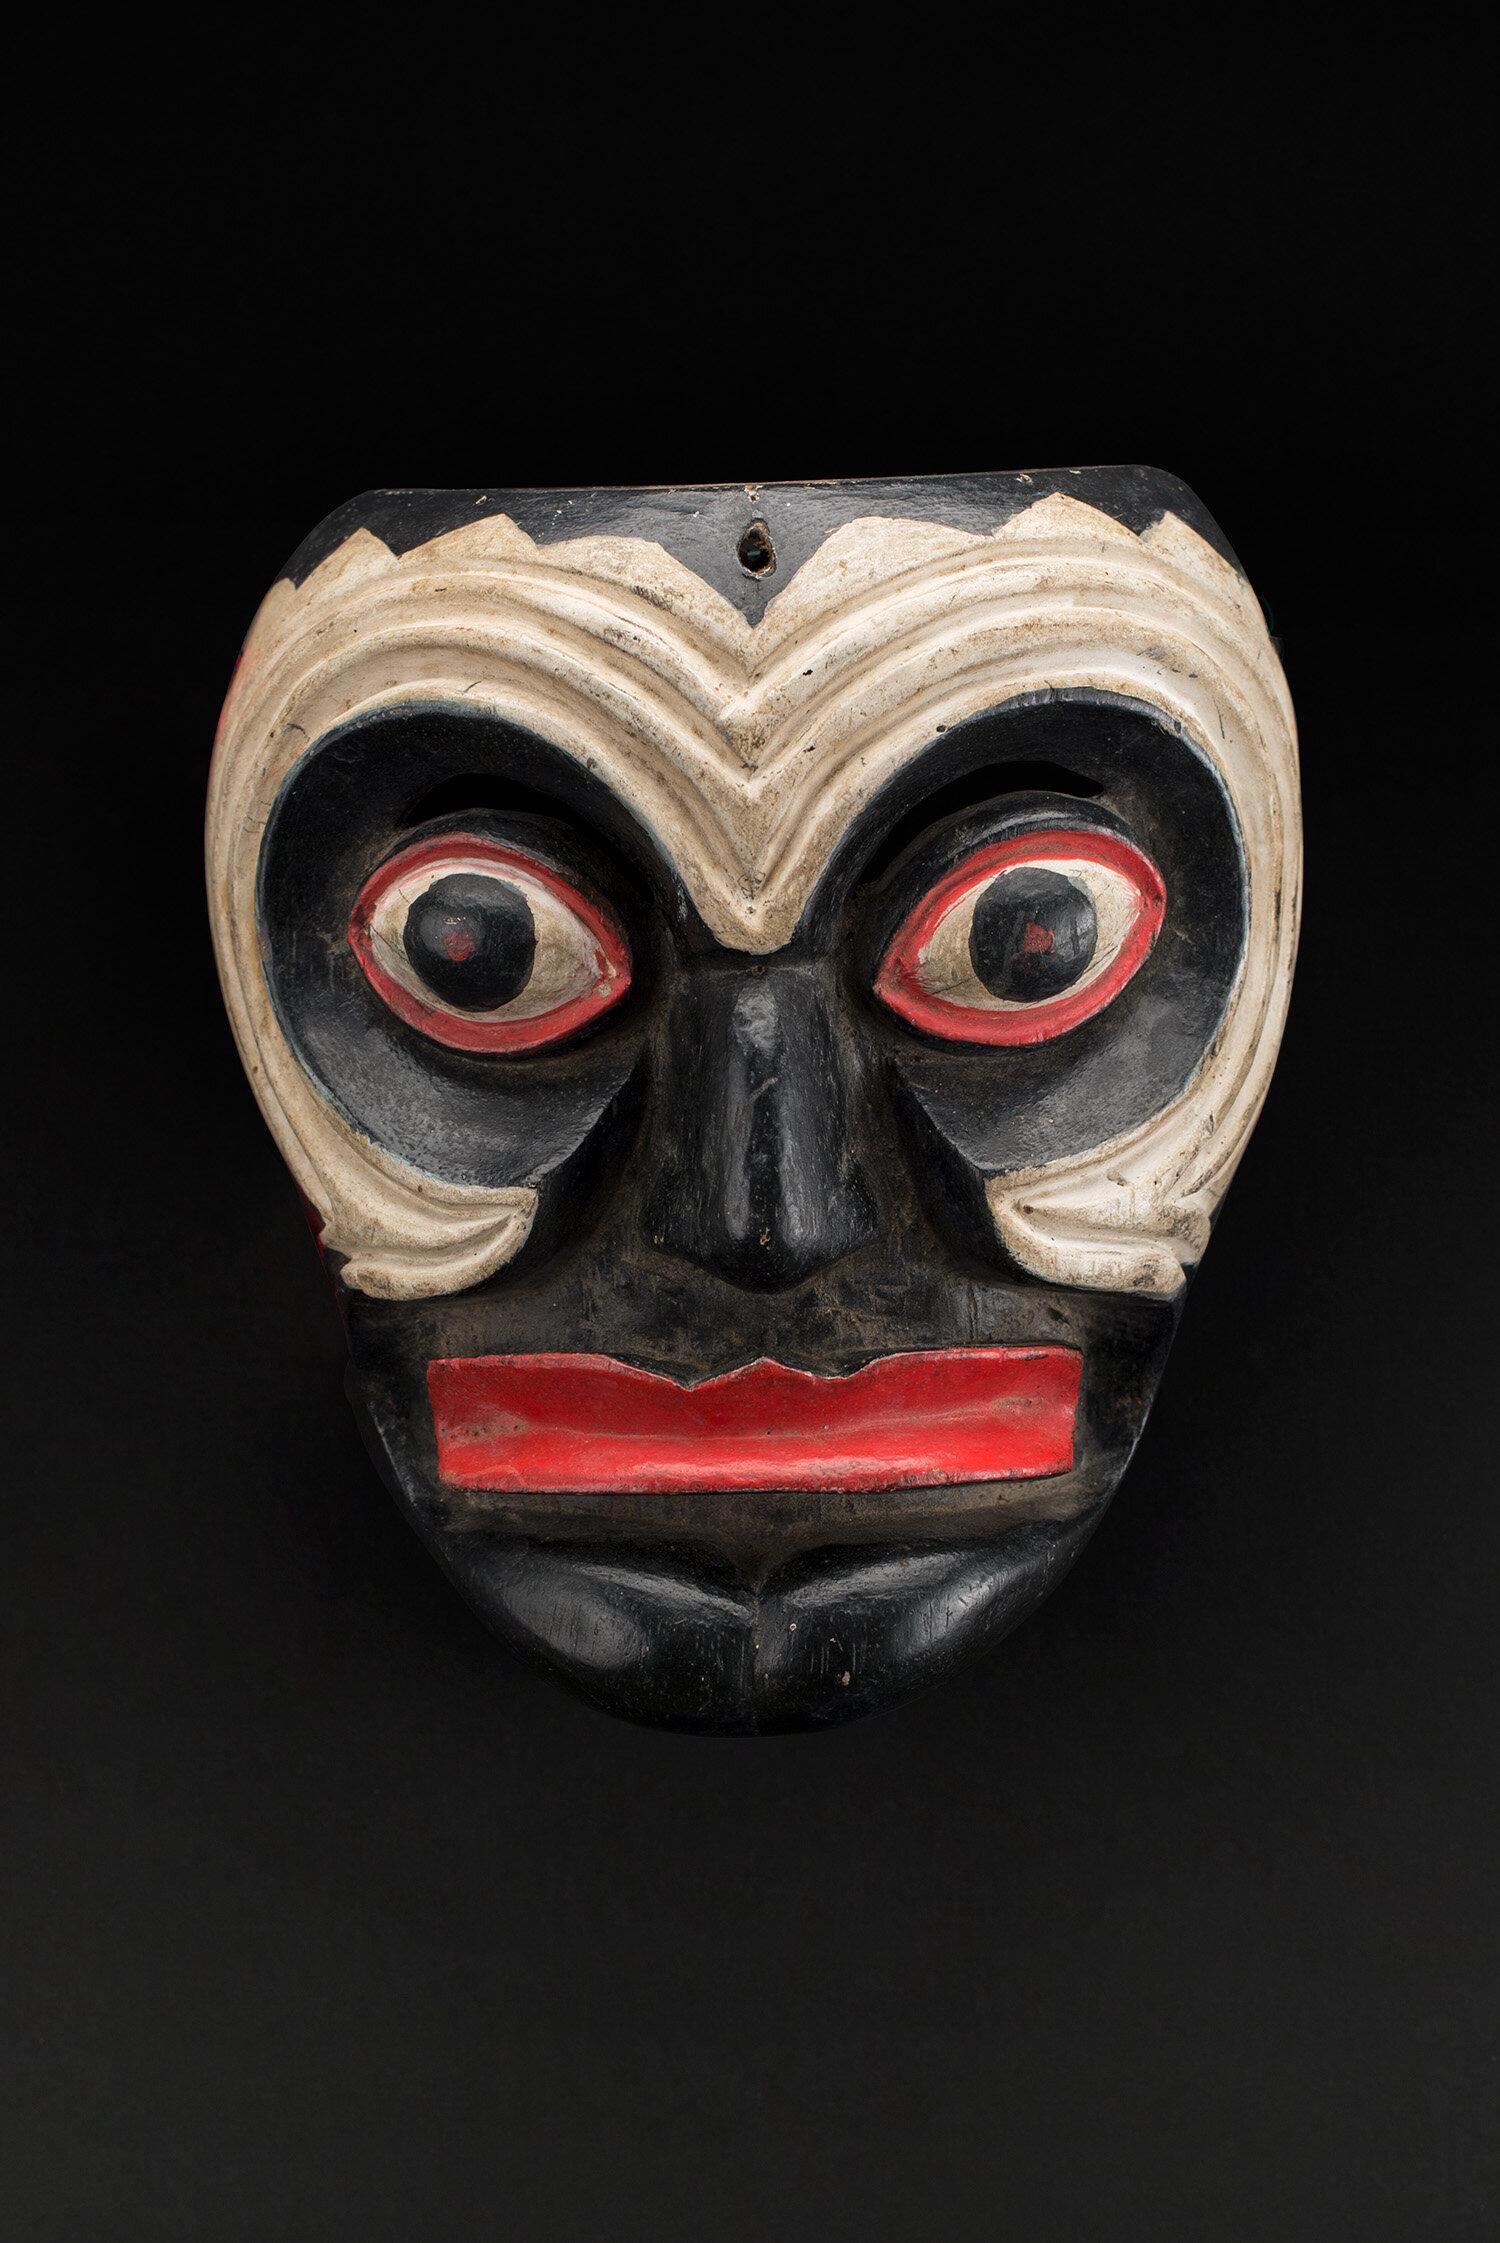 Masks  Oaxaca, Pinotepa Nacional Negrito  , Mid 20th C. Polychrome wood 7 x 6 x 3 inches 17.8 x 15.2 x 7.6 cm M 425